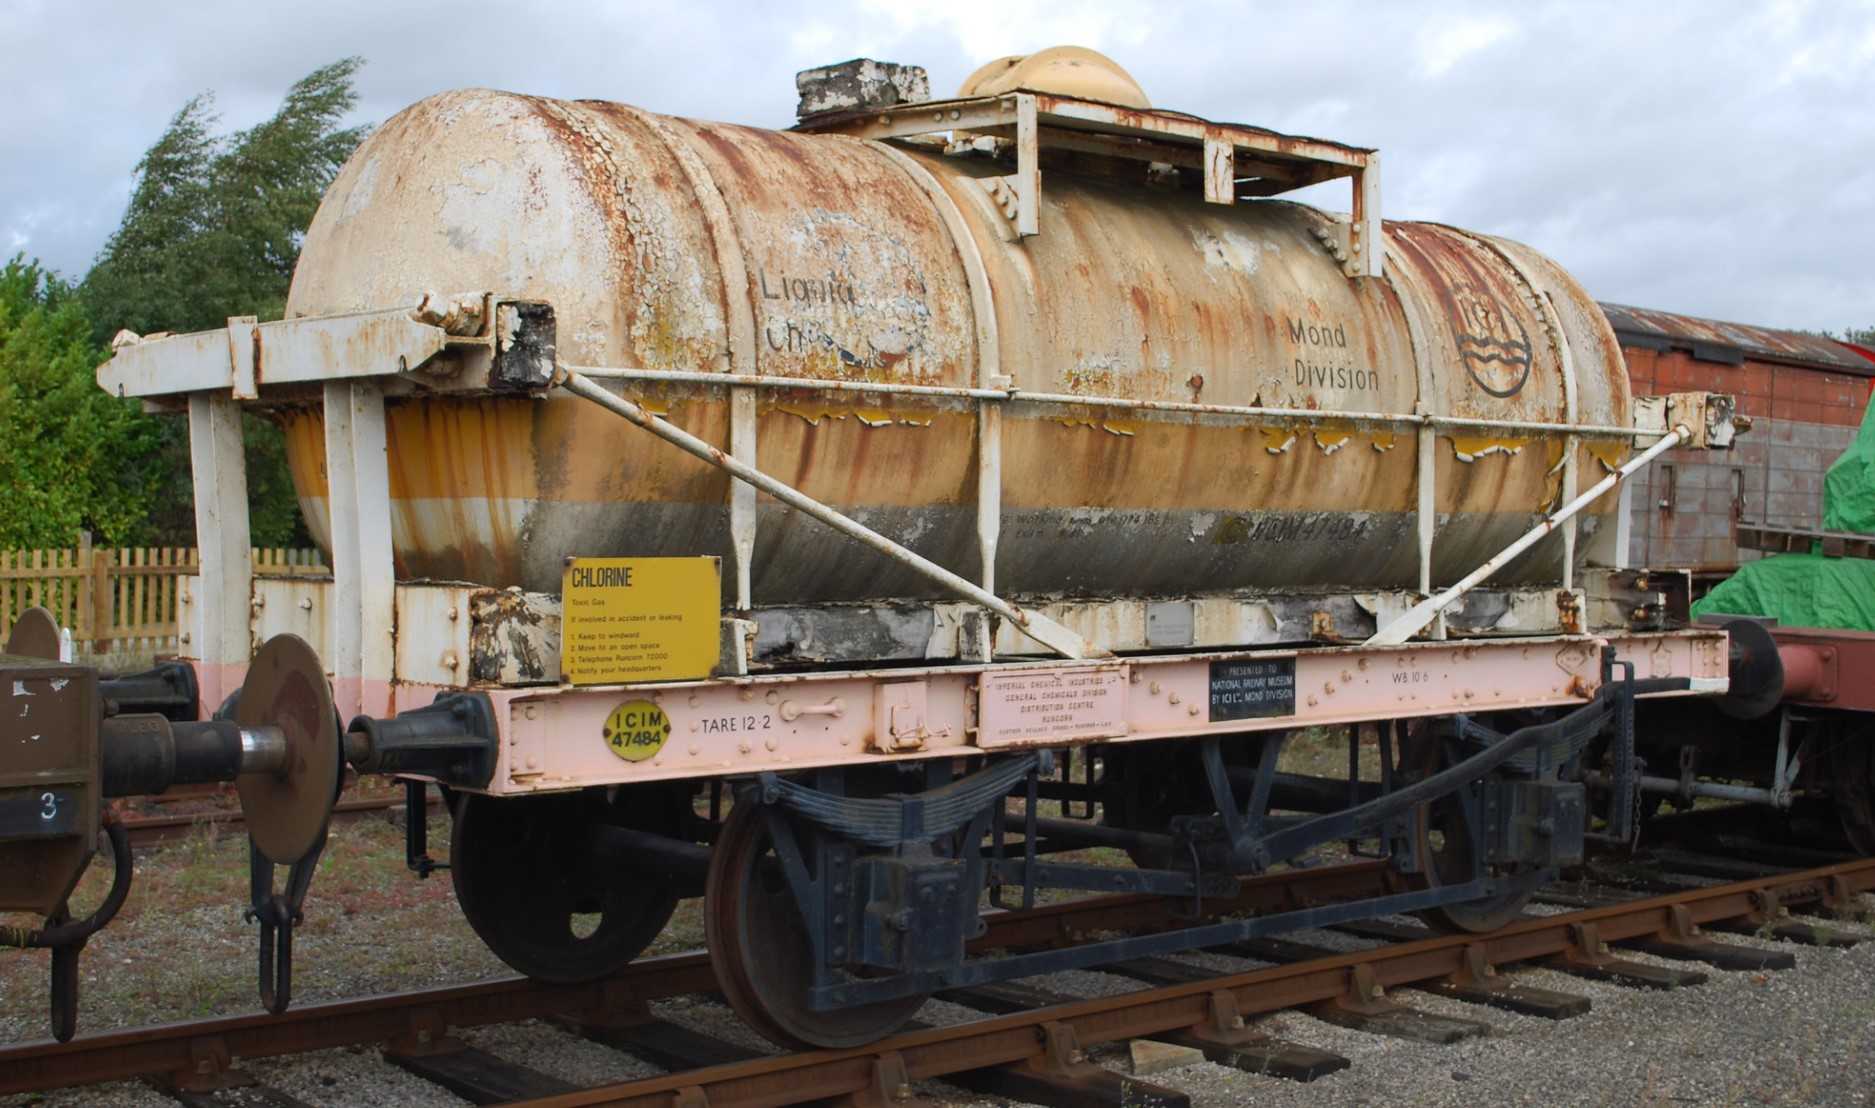 47484 at the National Railway Museum in September 2010. ©Hugh Llewelyn